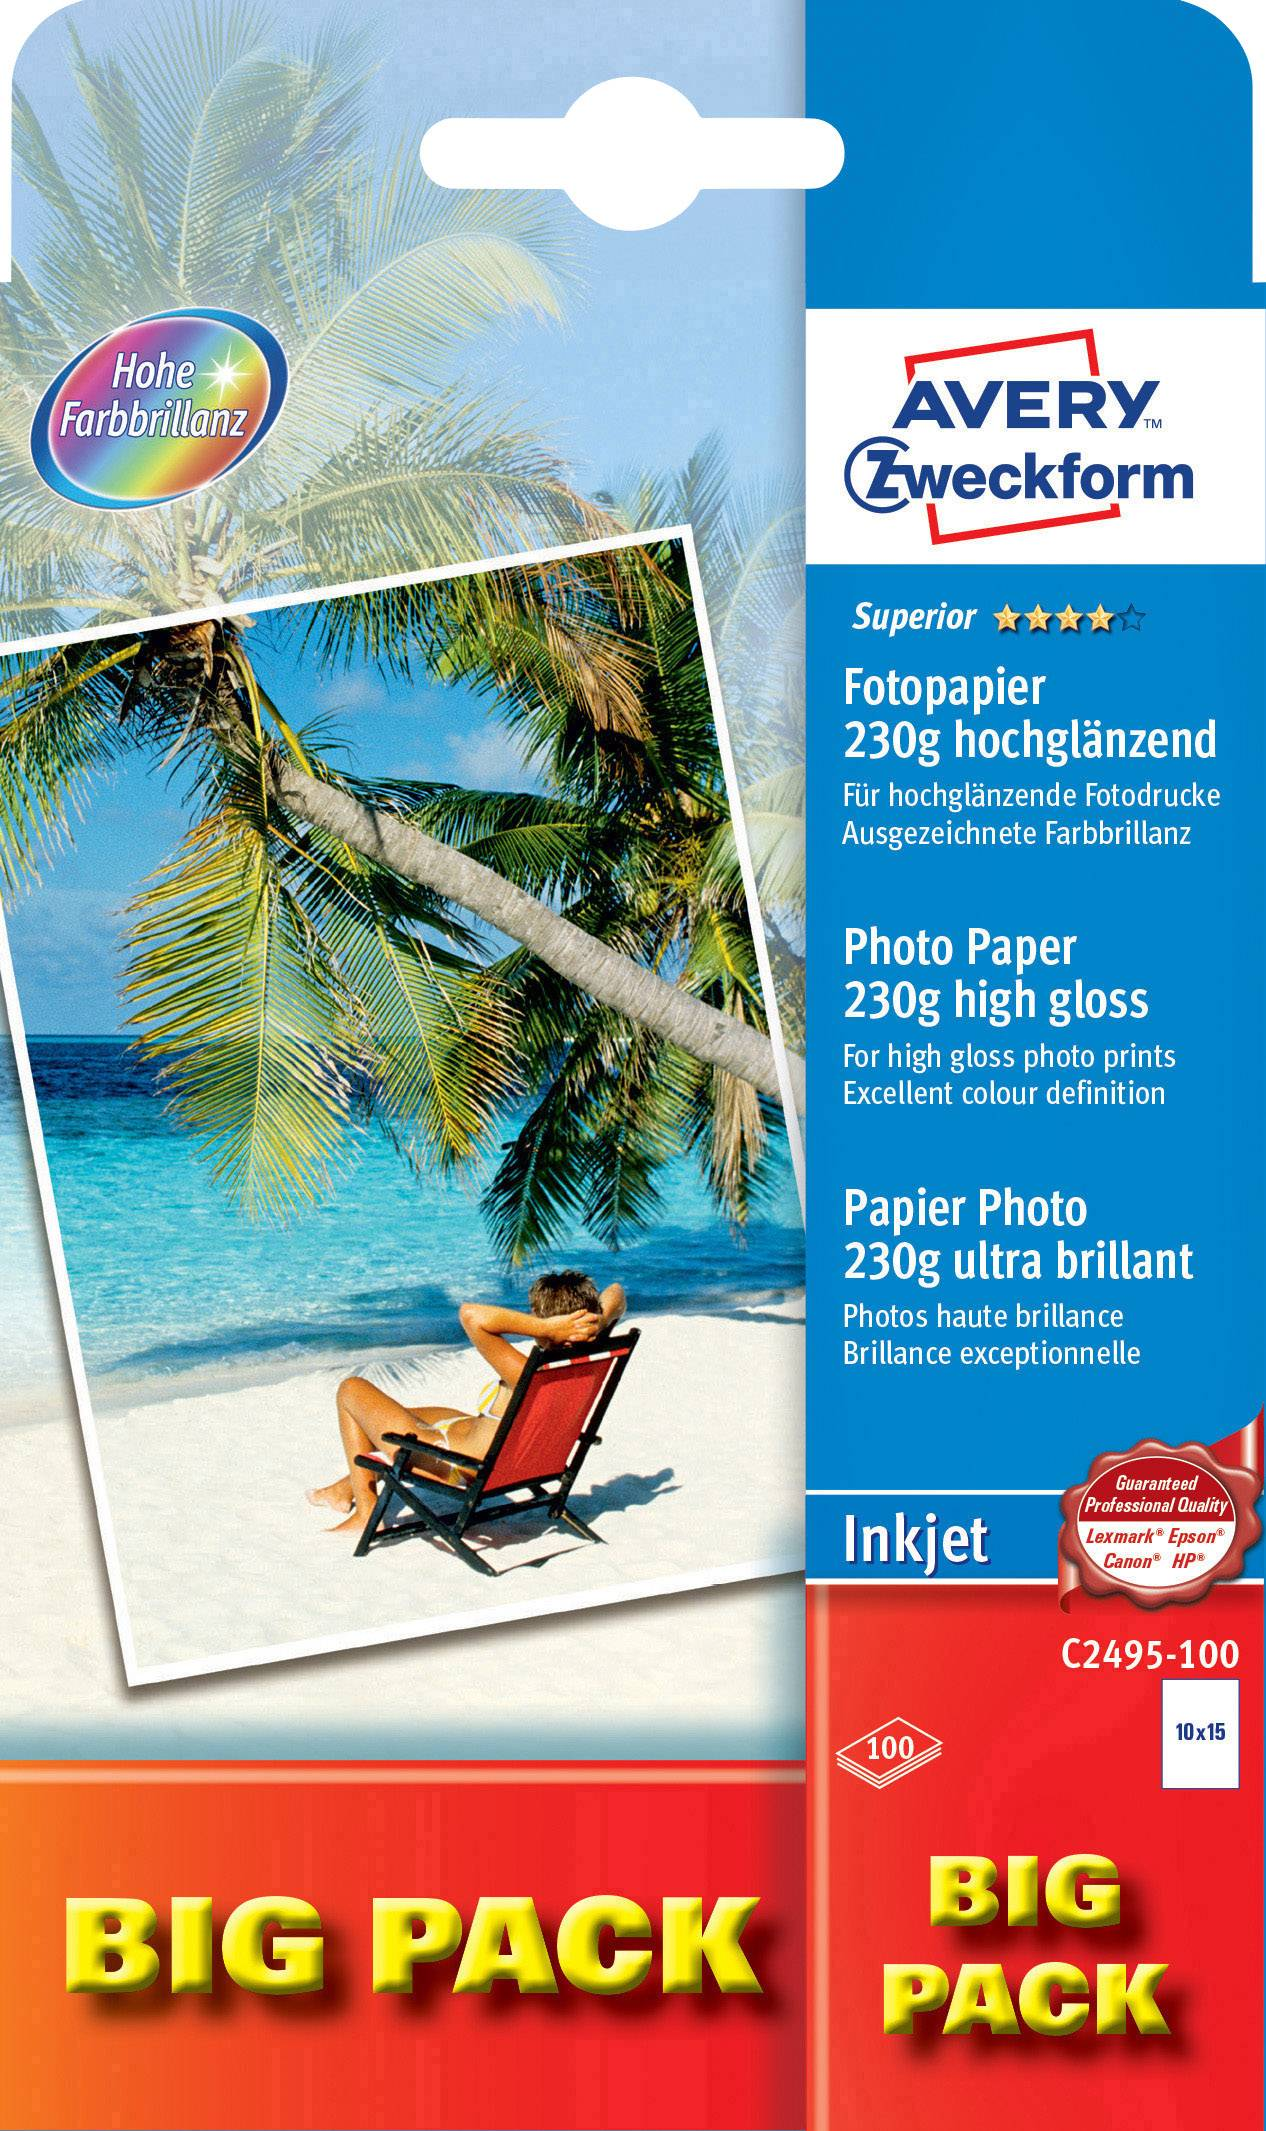 Fotopapír Avery-Zweckform Superior Inkjet C2495-100, 10 x 15, 230 g/m², 100 listů